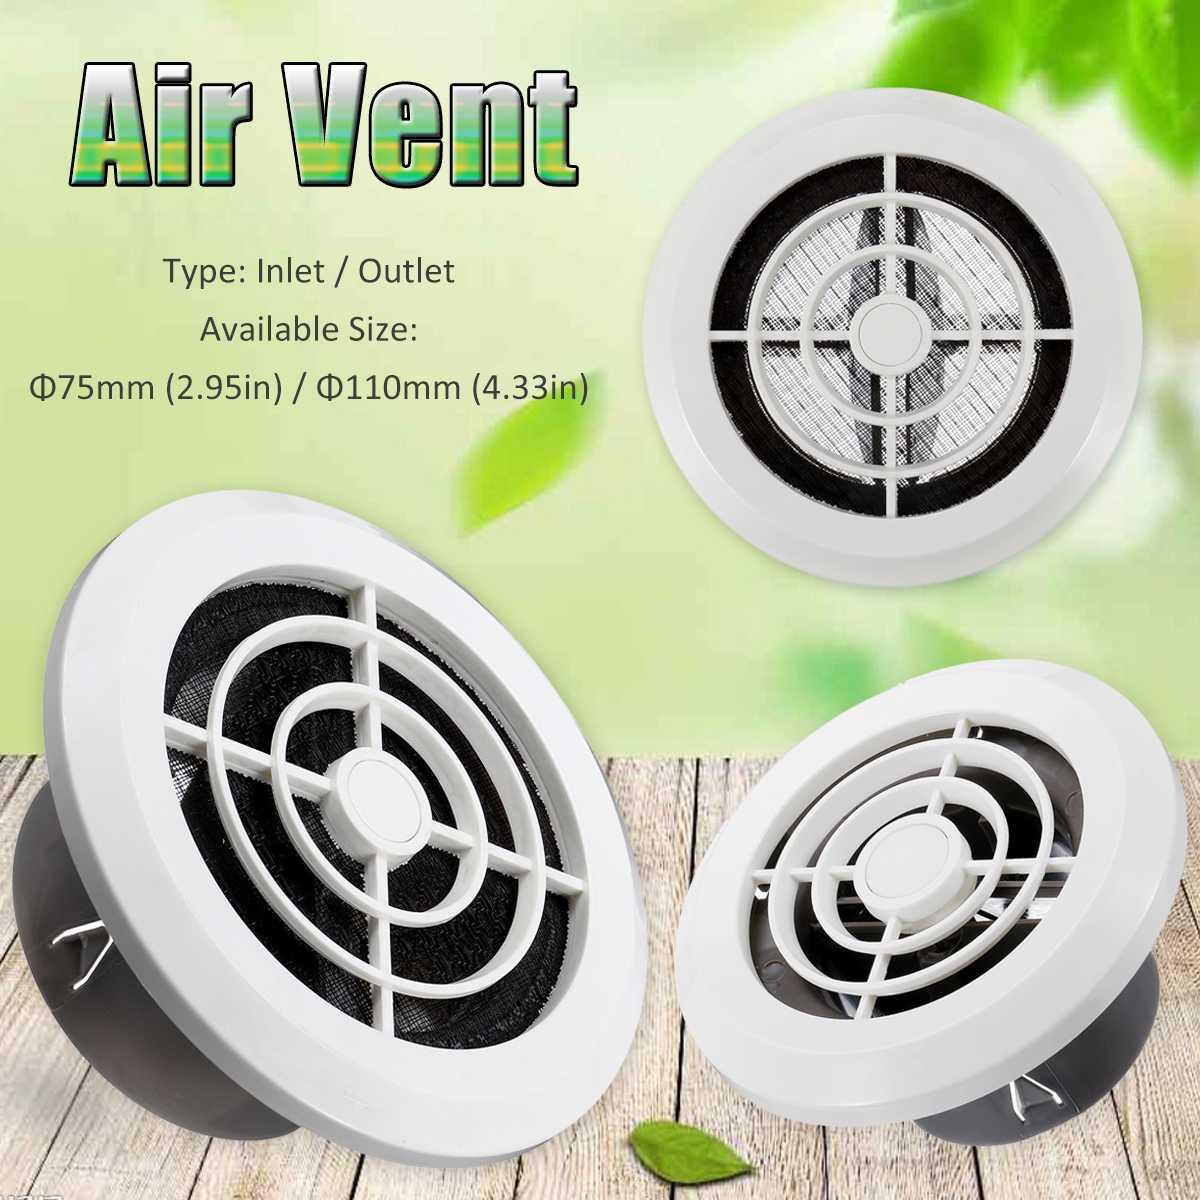 75/110mm Adjustable Ventilation Grille Grid Air Vent Round Louver Grille Cover Grate Ventilator For Bathroom Kitchen Ventilation